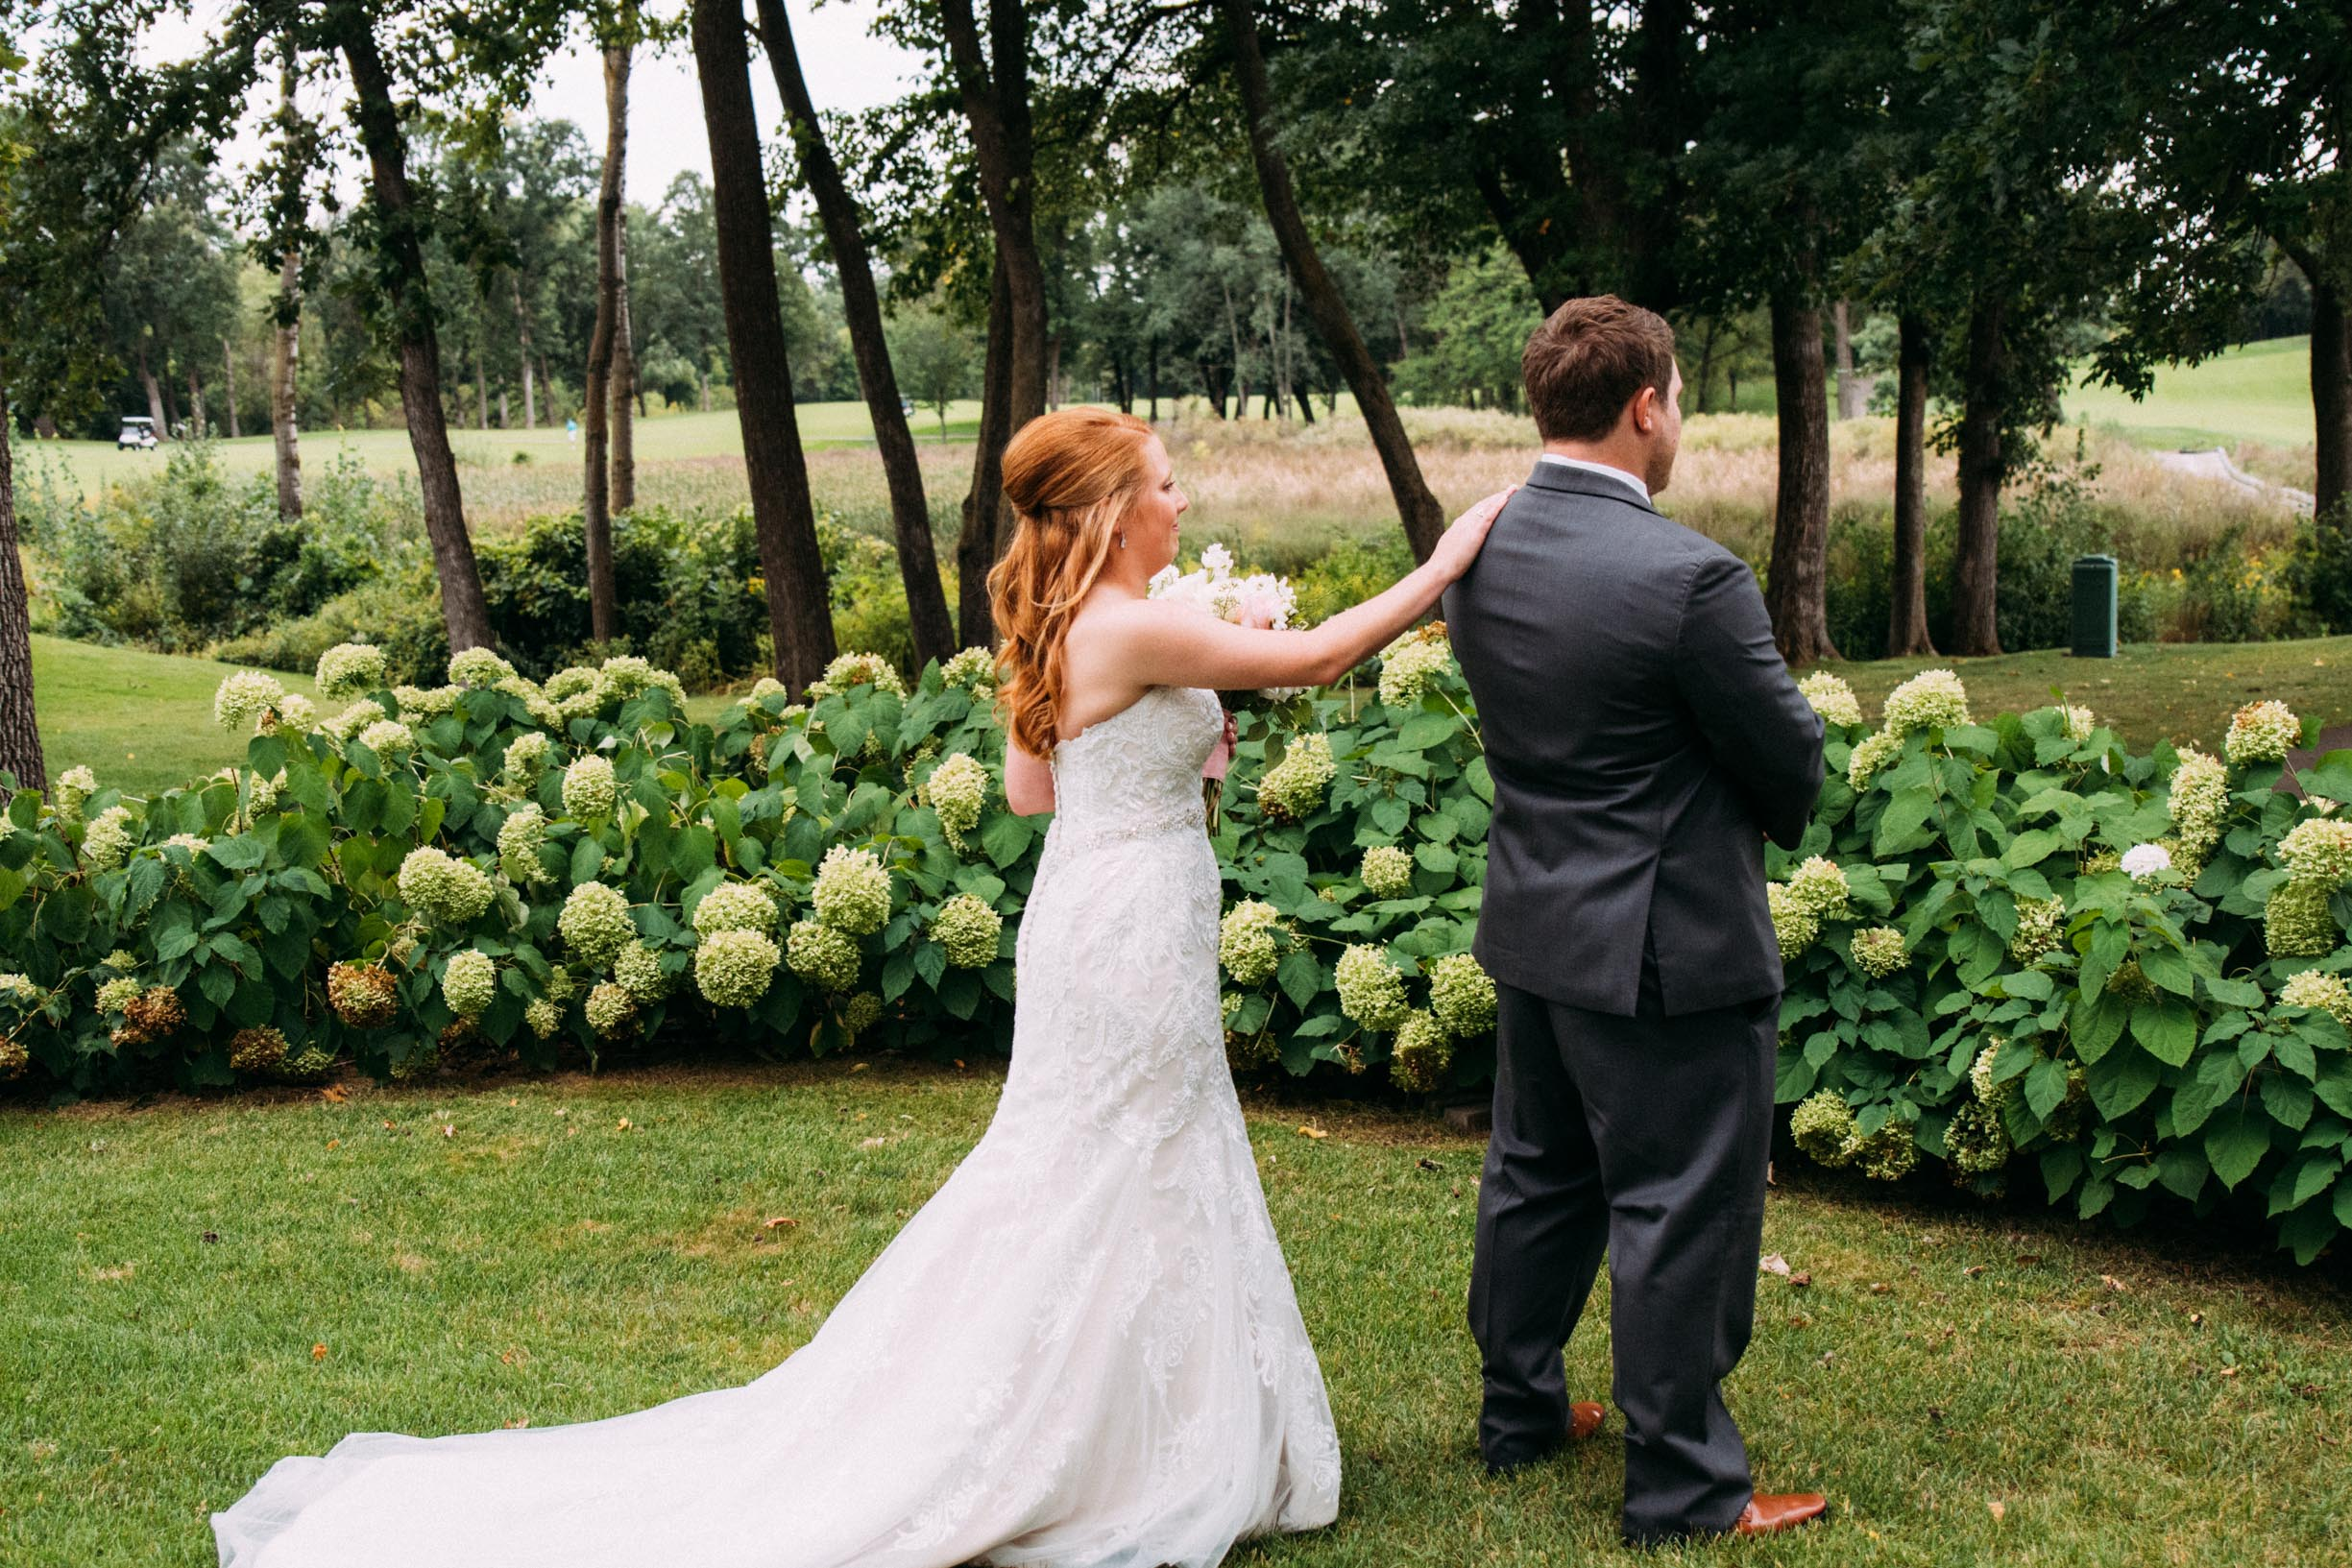 Megan_Zach_Minneapolis_Bearpath_Wedding_Blog-17.jpg